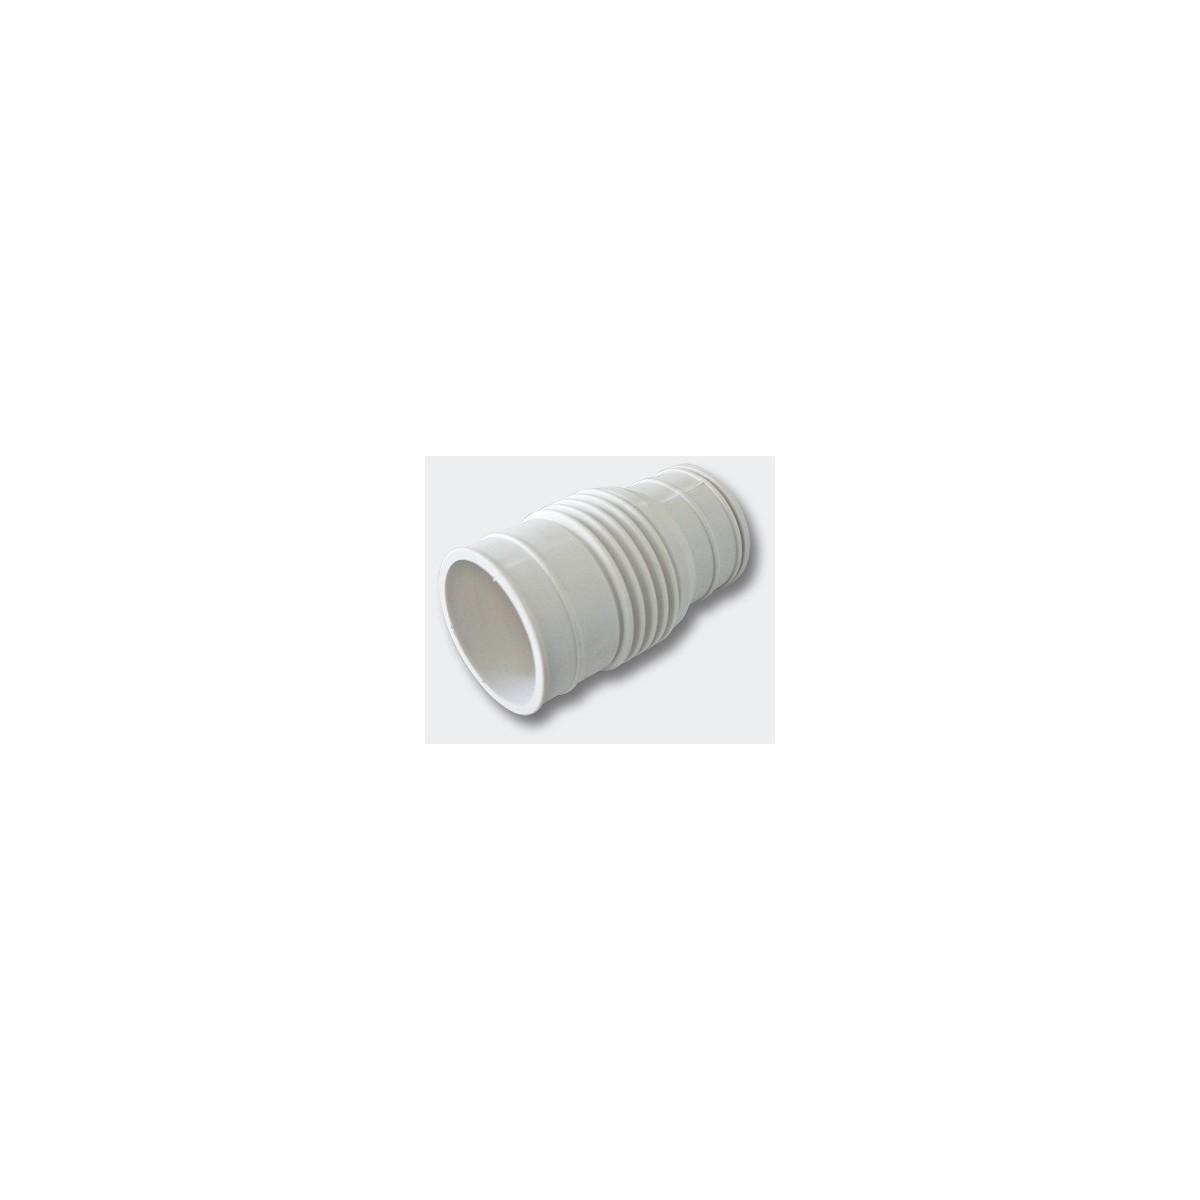 Raccord-flexible-obturateur-broyeur-wc-sanitaire